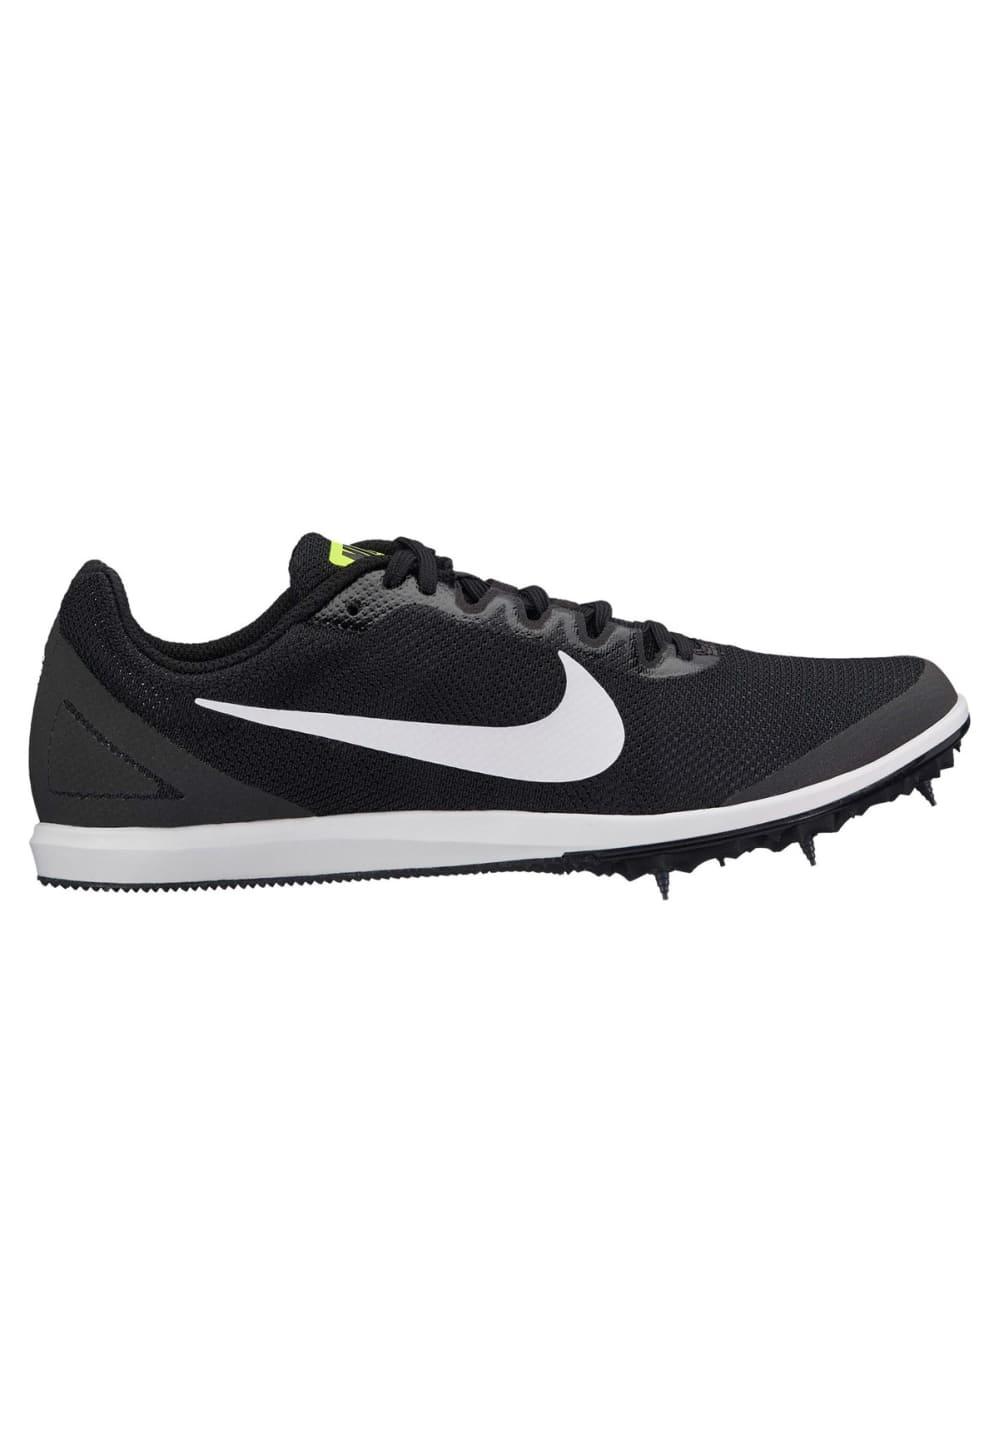 official photos 2727a aa9ab Nike Zoom Rival D 10 Track Spike - Spikes für Damen - Schwar